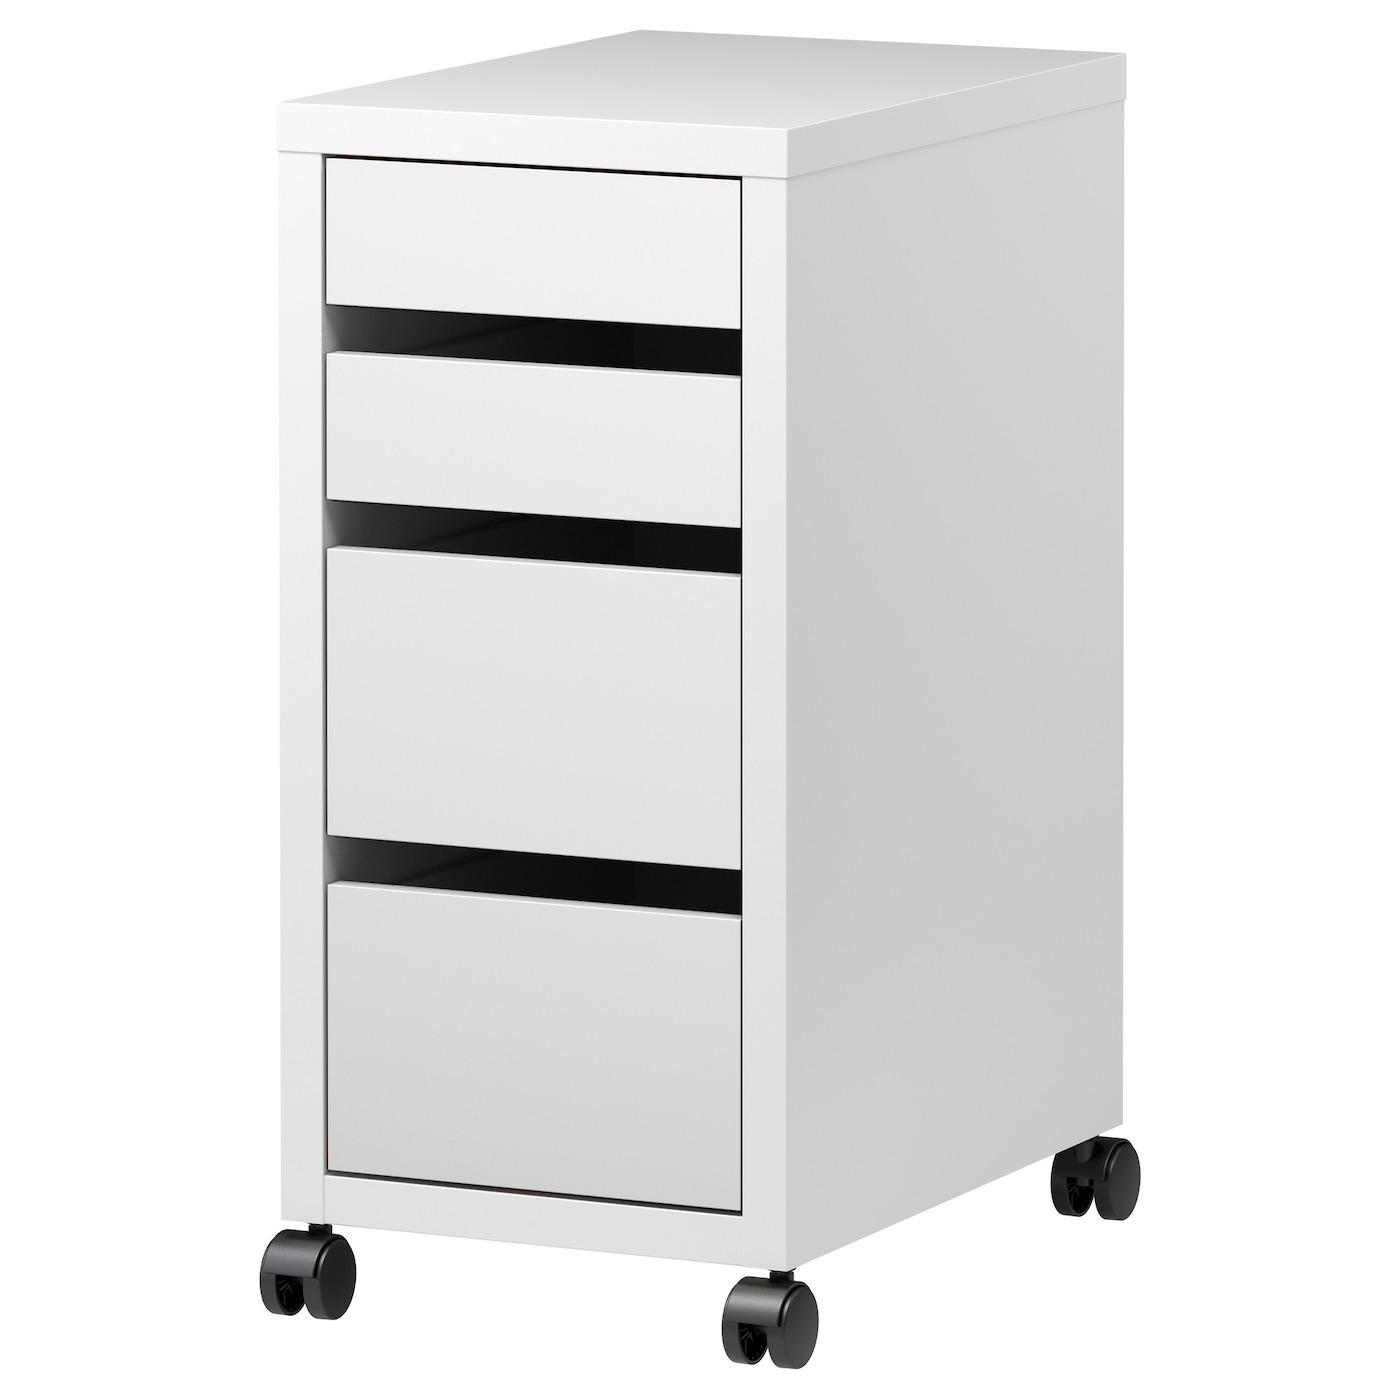 micke caisson tiroirs sur roulettes blanc 35x75 cm ikea. Black Bedroom Furniture Sets. Home Design Ideas